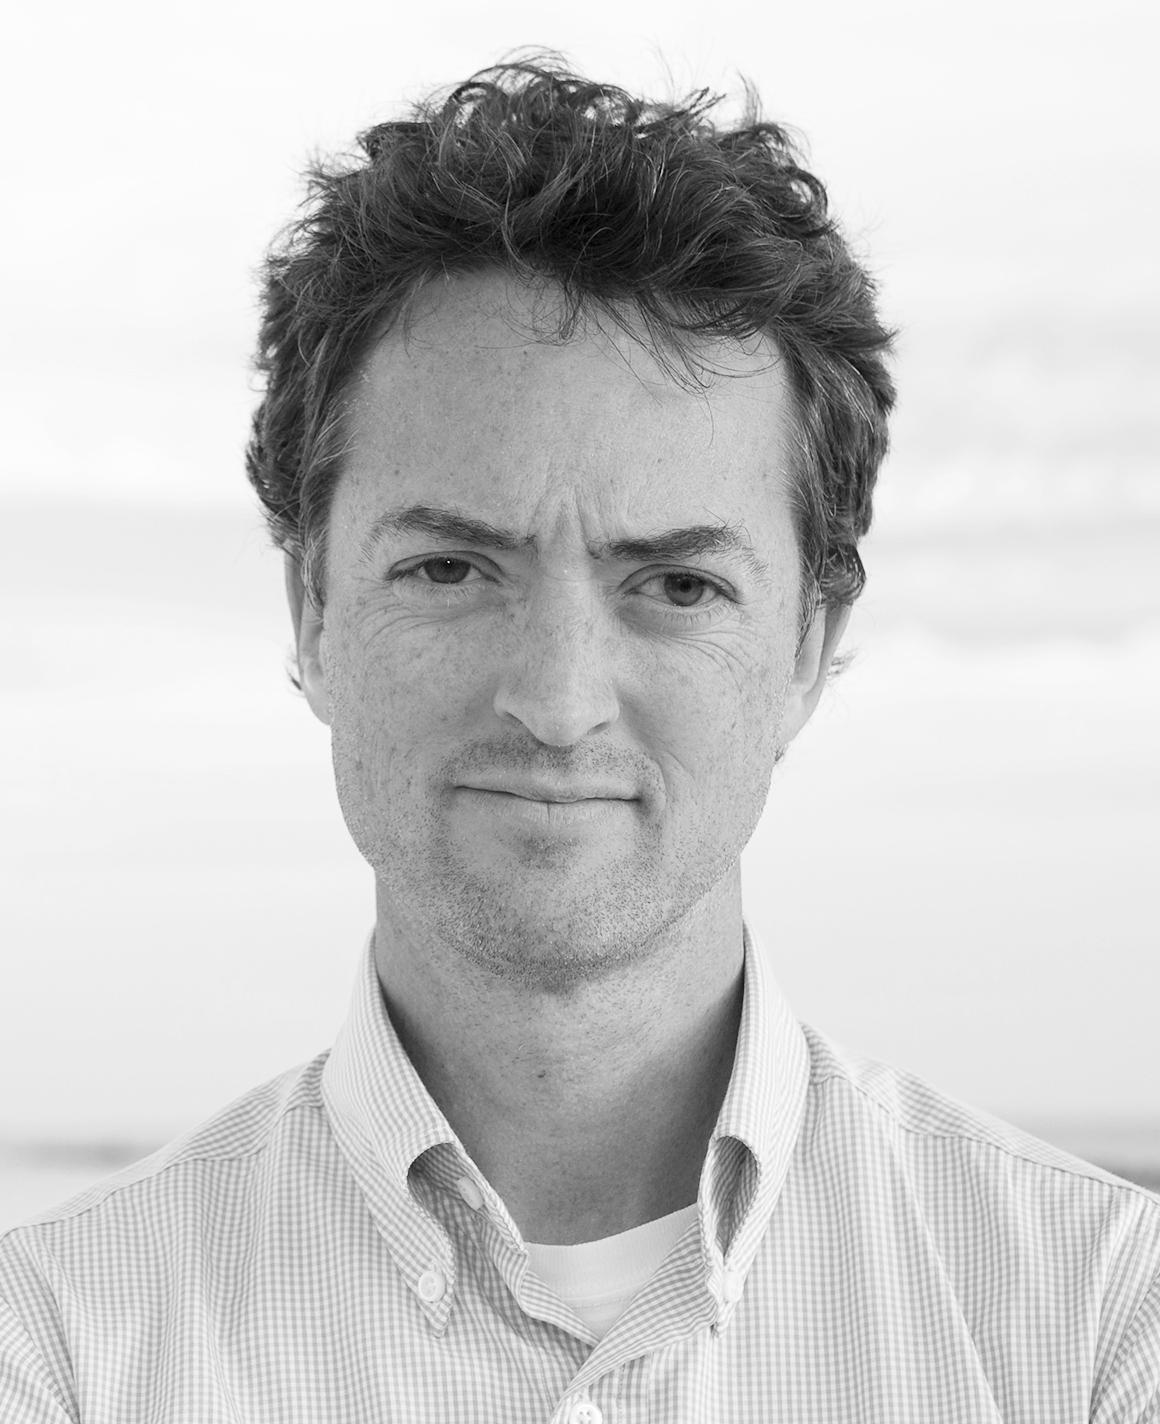 Tim HosslerAssociate Professor, KU -